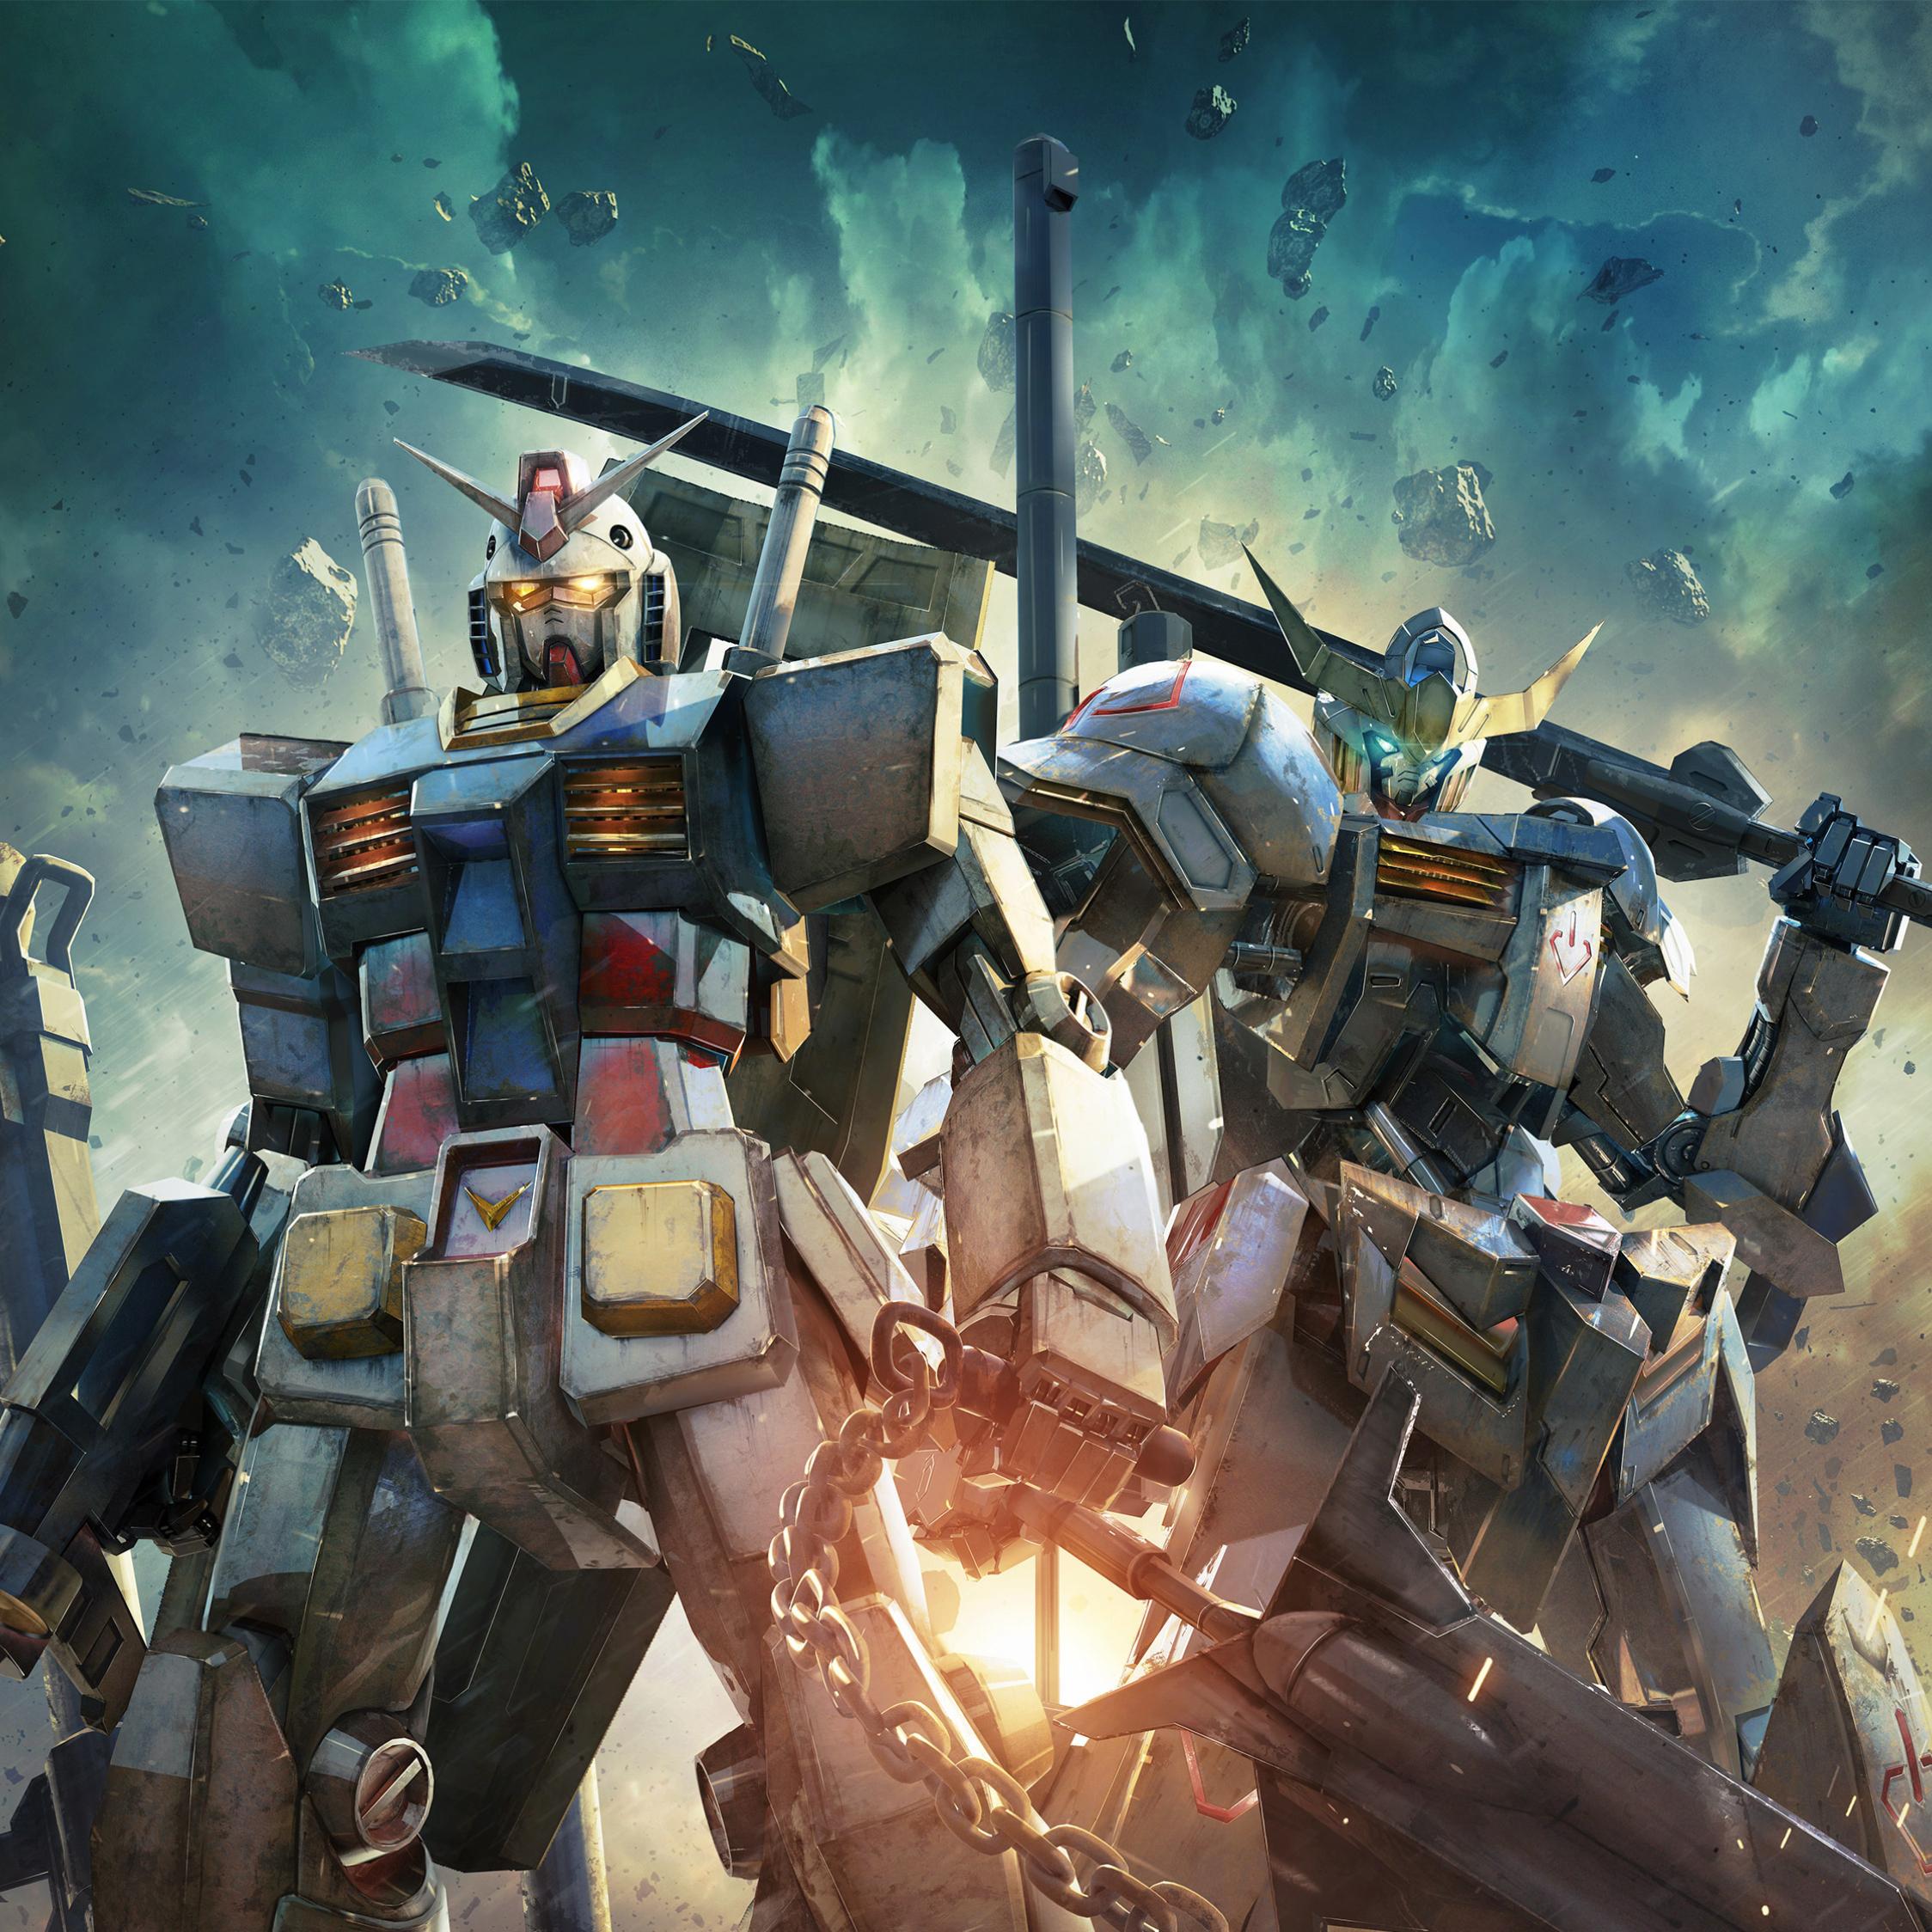 Gundam Iphone Wallpaper: Gundam Versus 2017, HD 4K Wallpaper